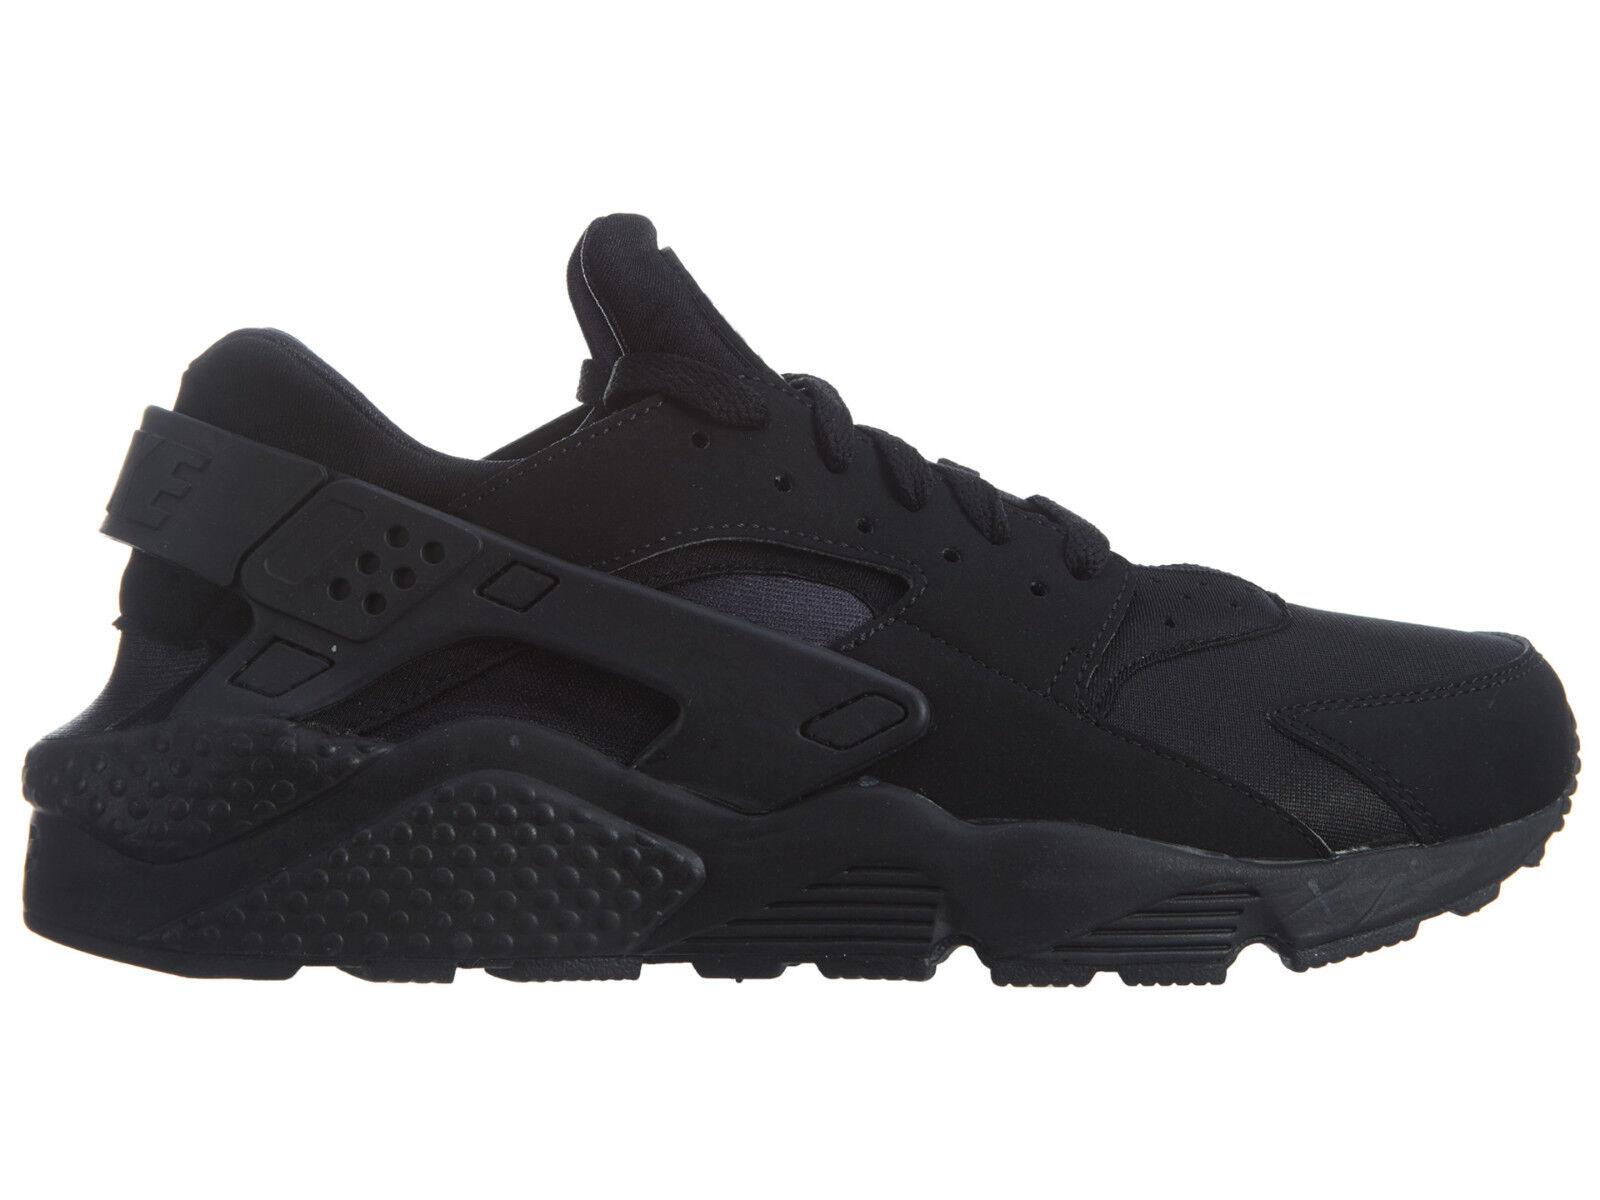 Nike Air Athletic huarache hombre 318429-003 Negro Textile Athletic Air running zapatos cómodos 8da40b